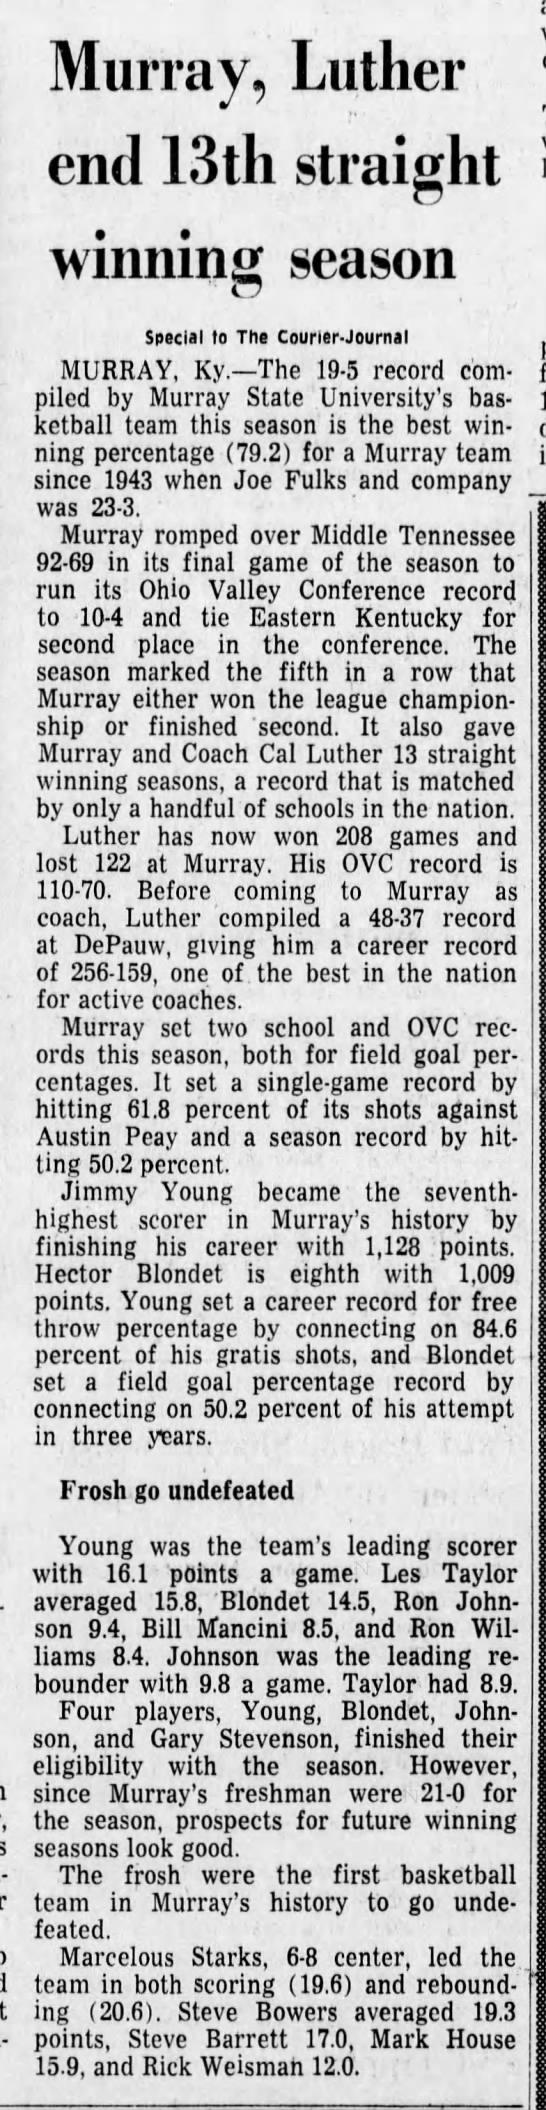 Jimmy Young Career Records Marcelous Starks leading scorer and rebounder for freshmen team.